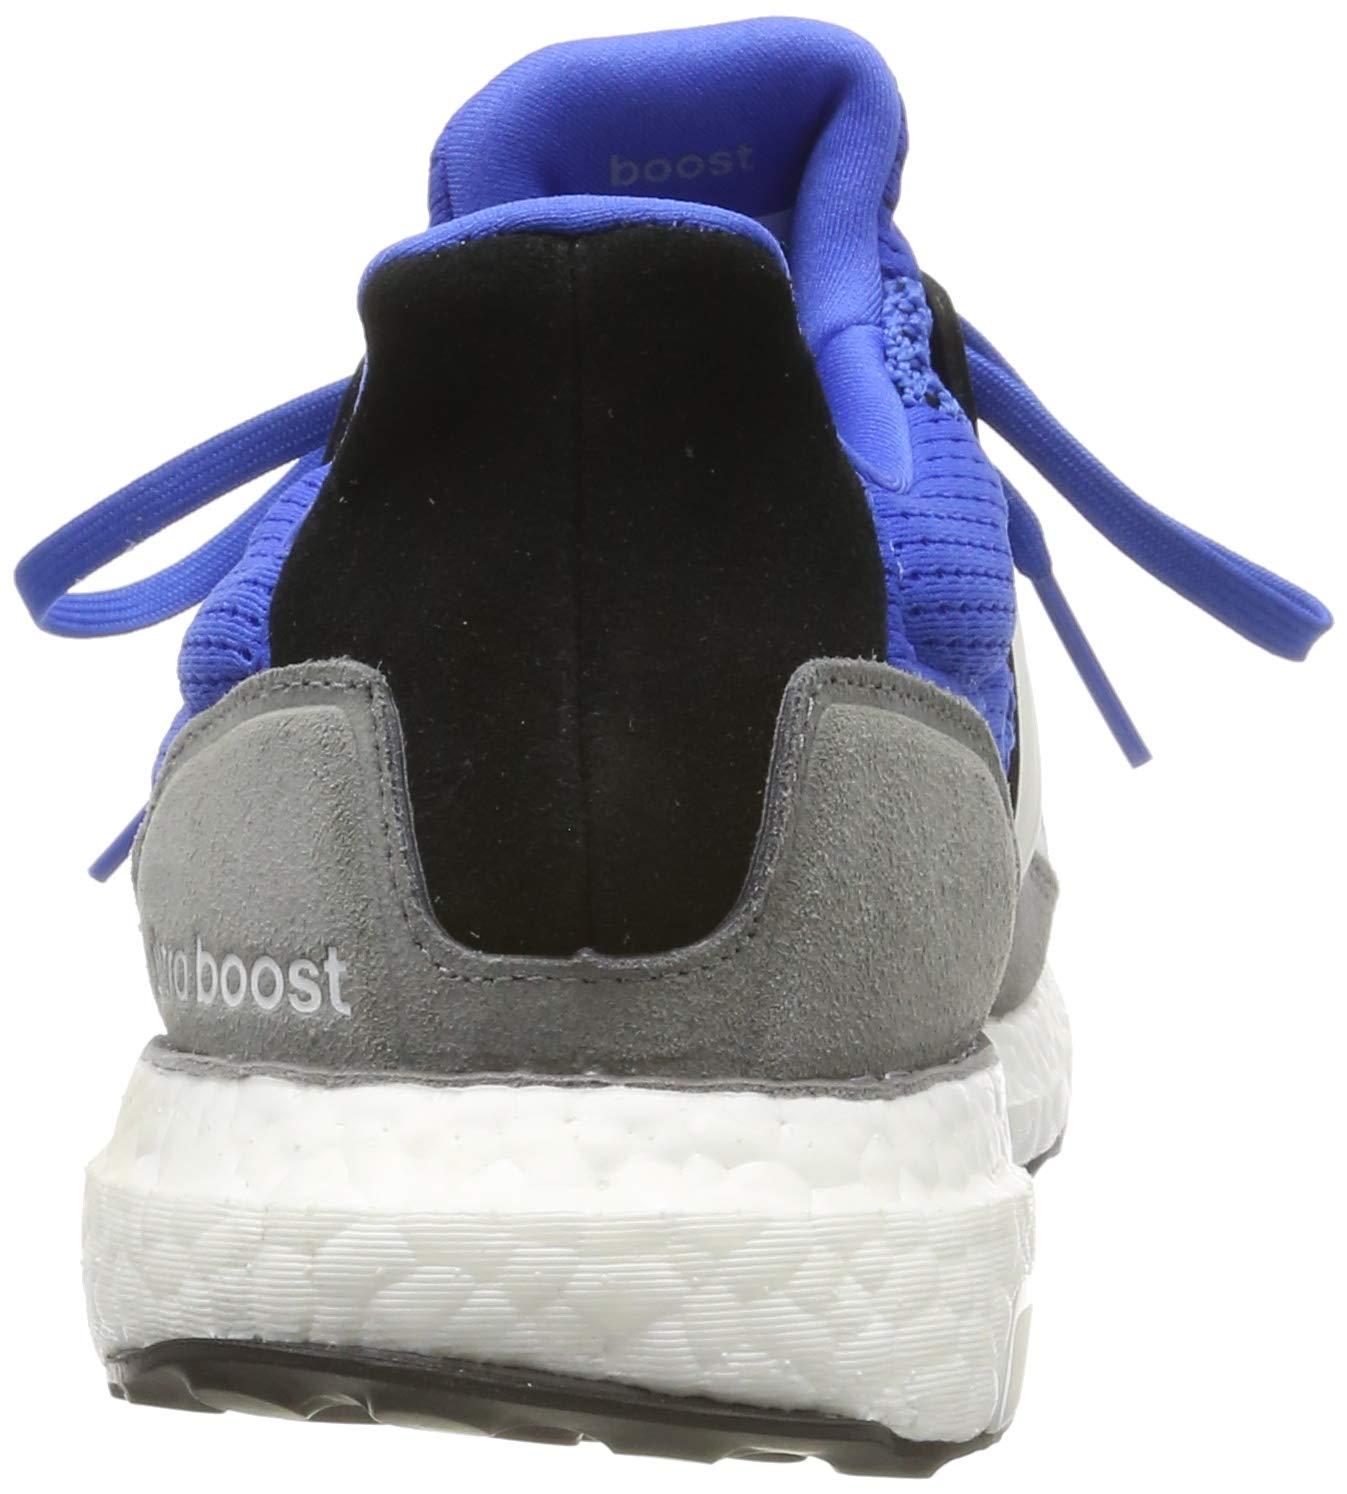 adidas Ultraboost S&l, Scarpe da Running Uomo 2 spesavip